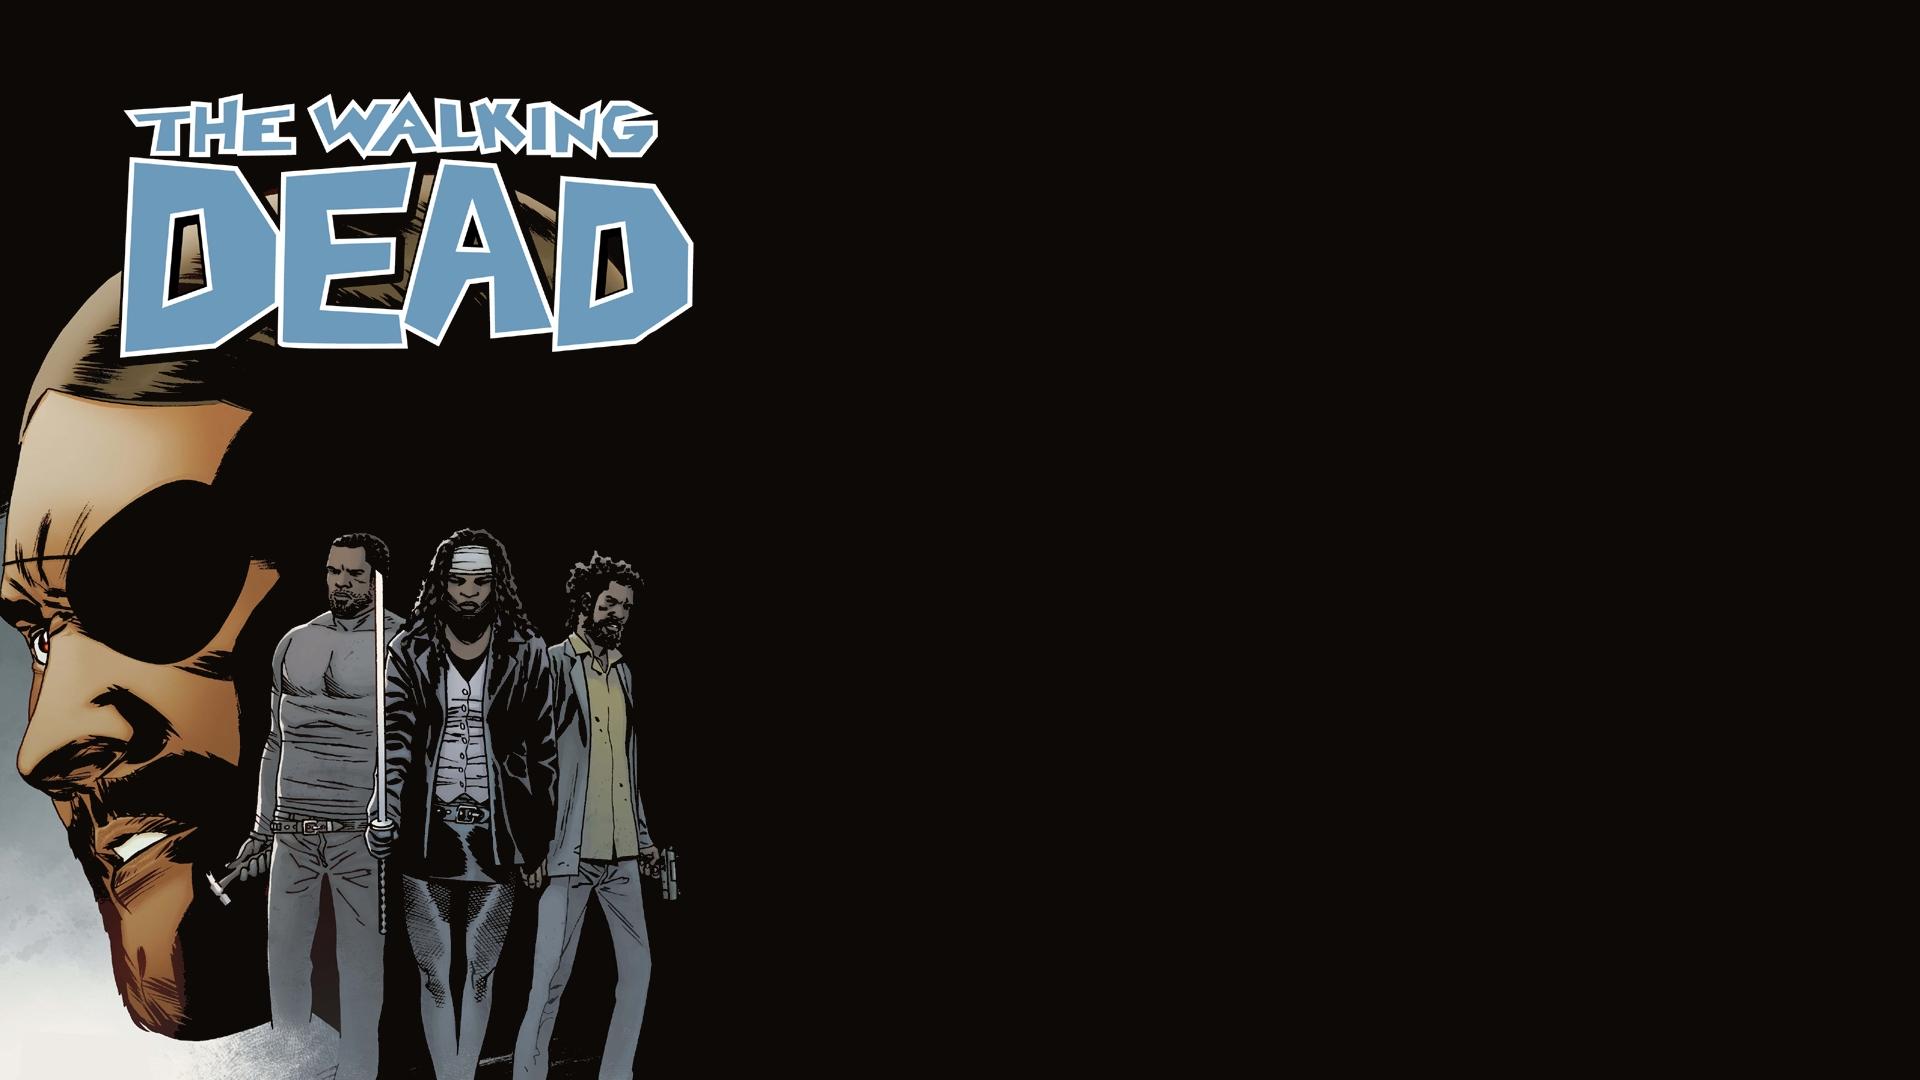 The Walking Dead Comic Iphone Wallpaper Comics   the walking dead 1920x1080